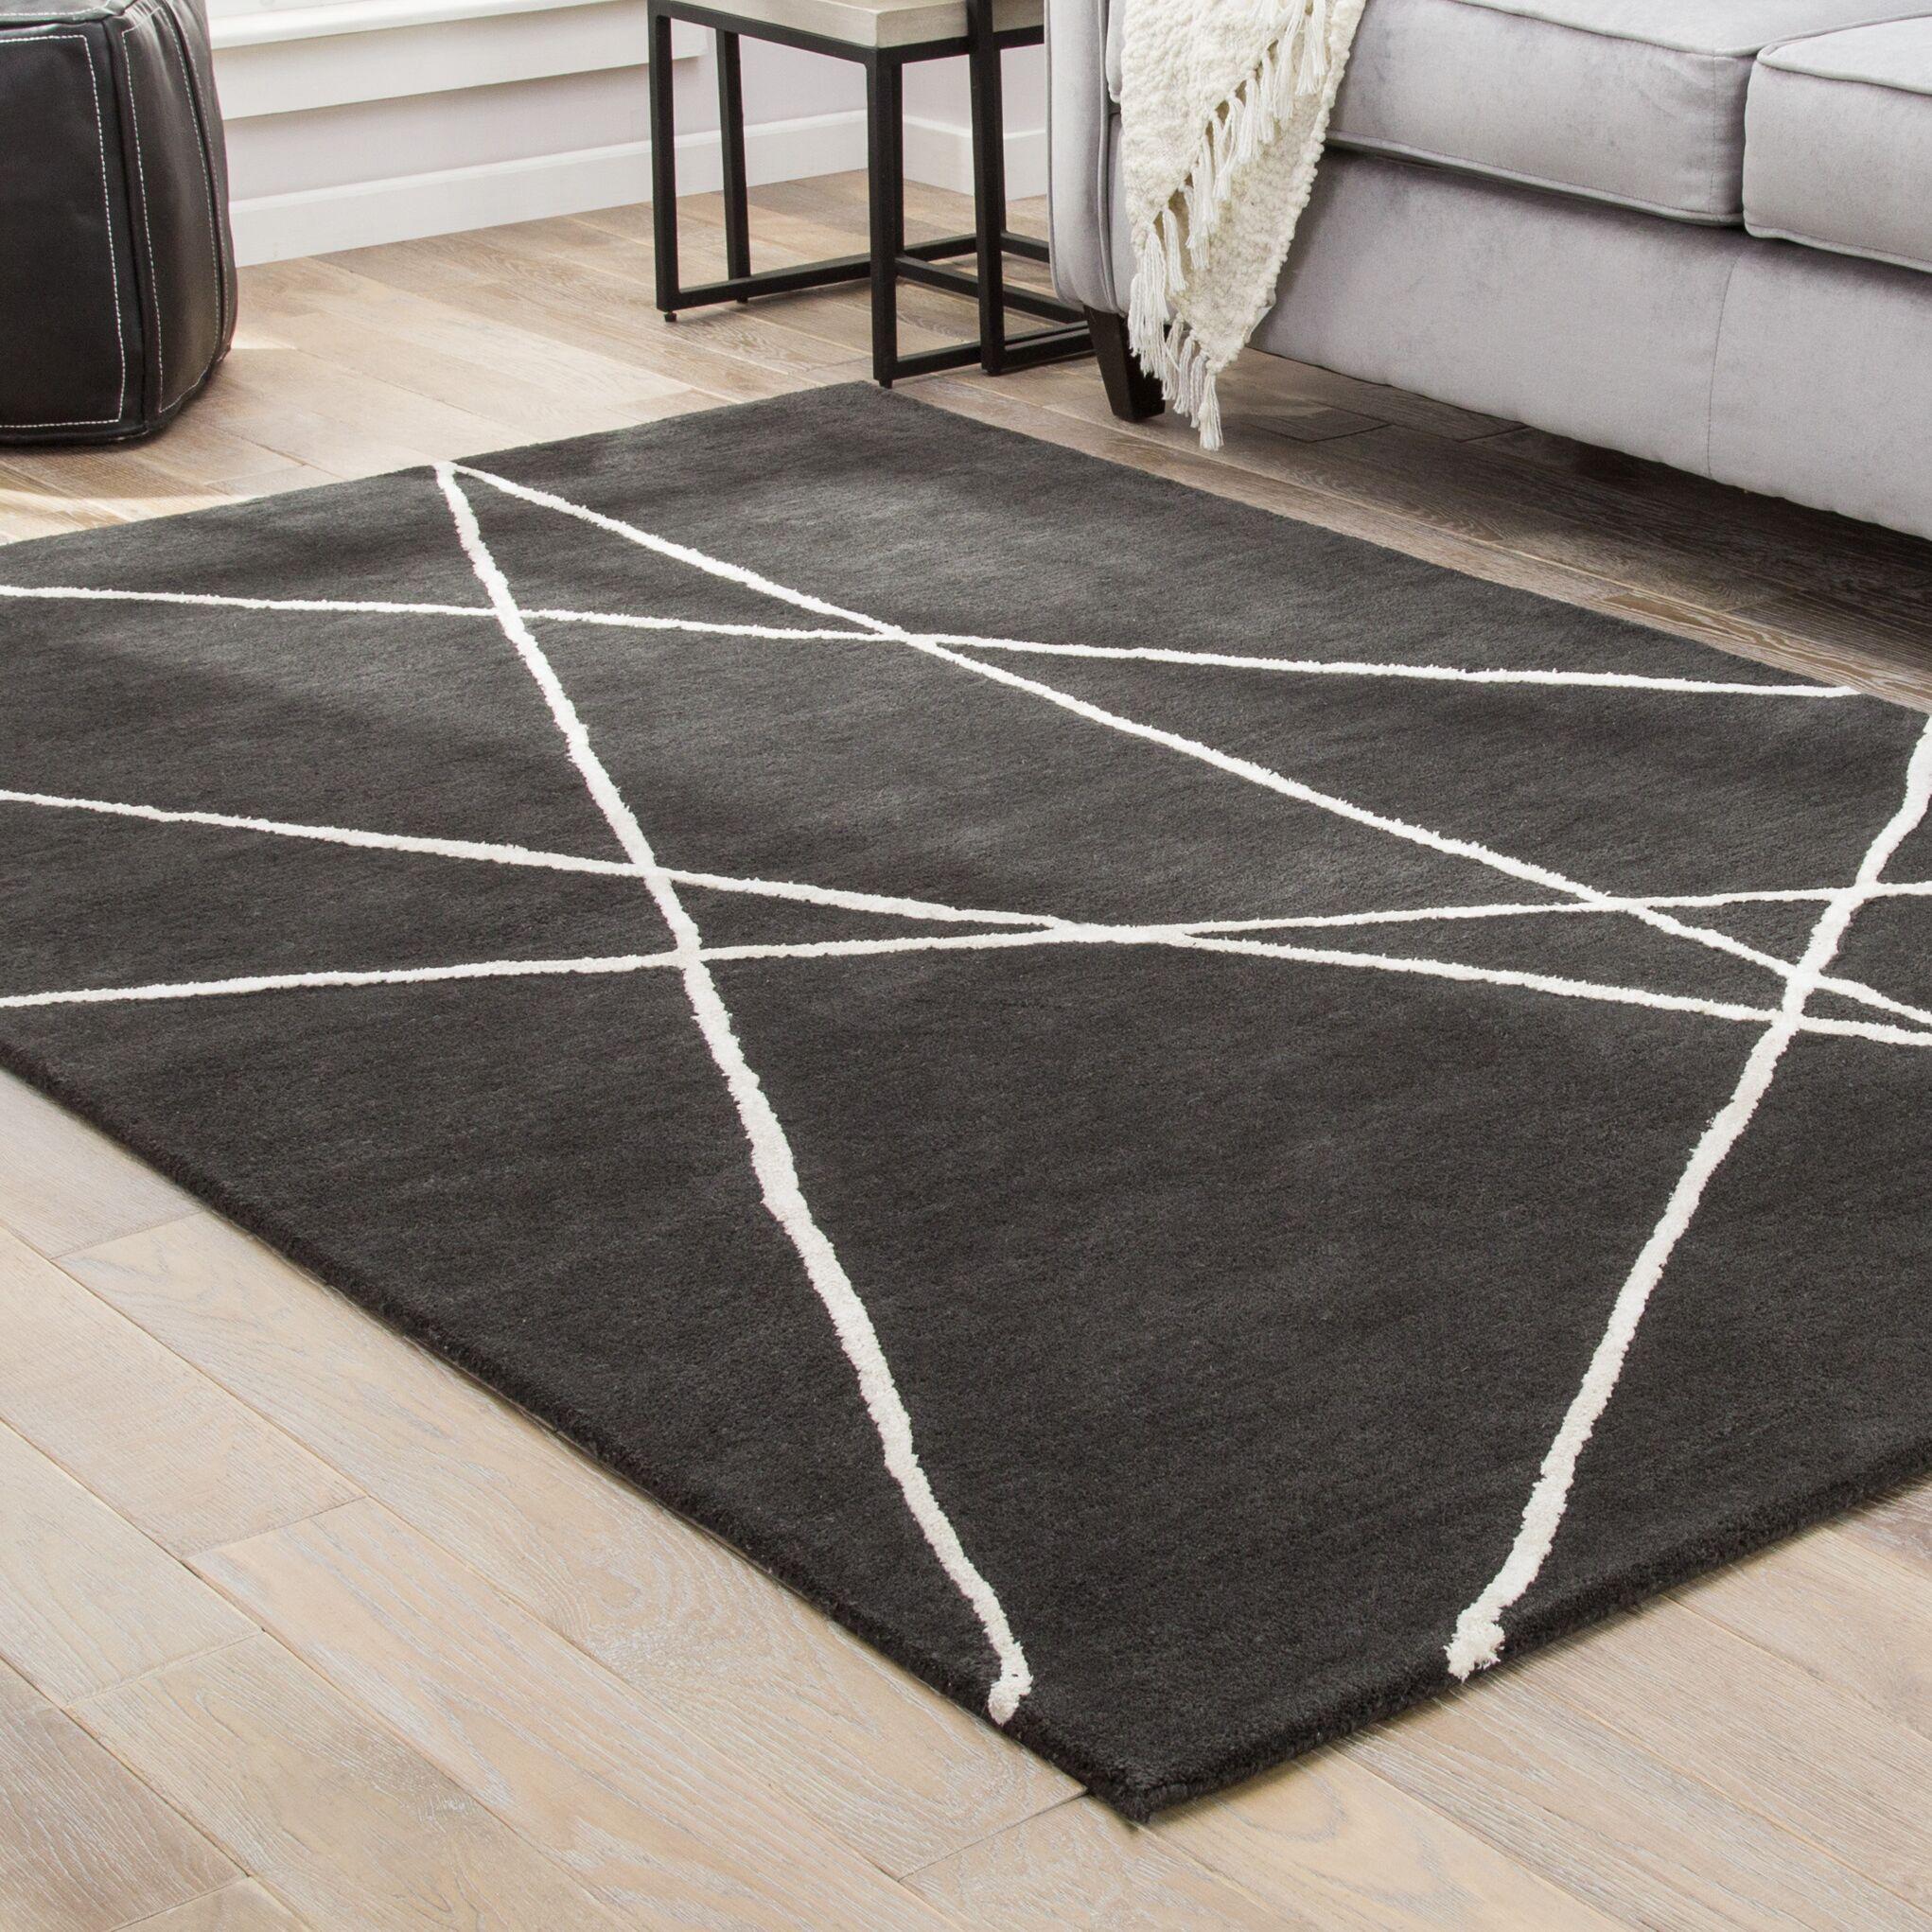 Ashton Hand-Tufted Black/White Area Rug Rug Size: Rectangle 9' x 12'